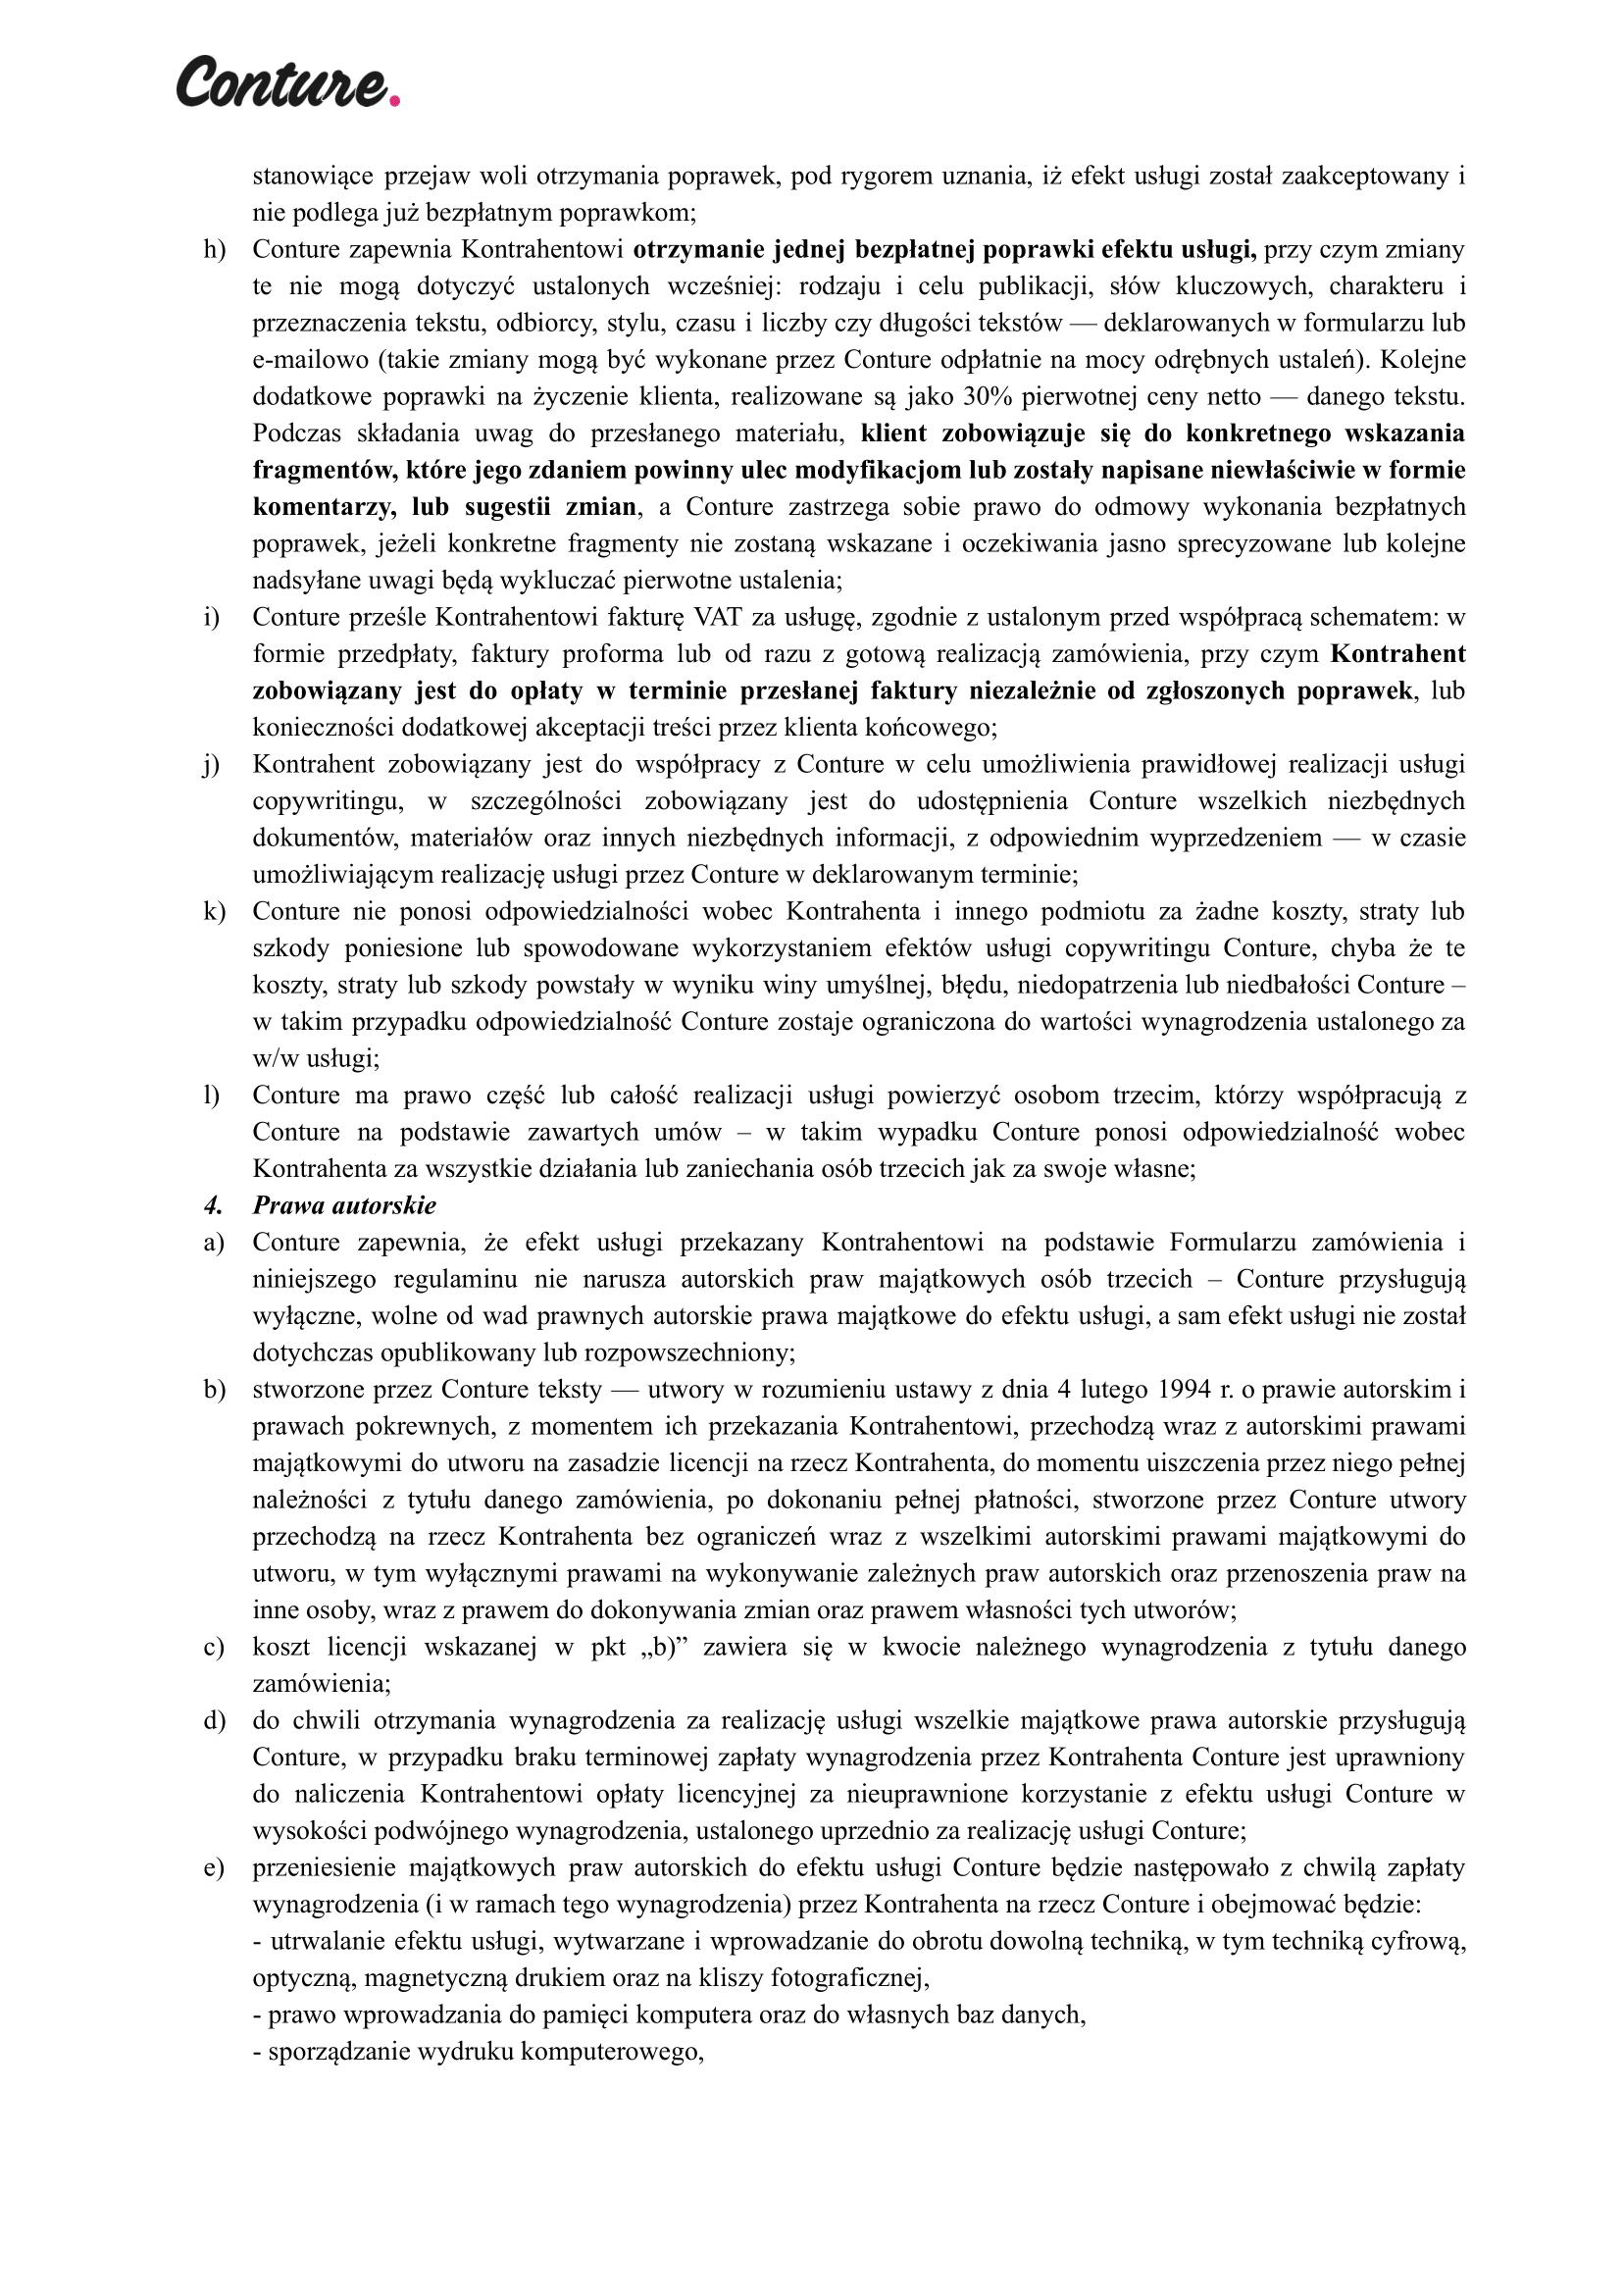 Regulamin Handix 2